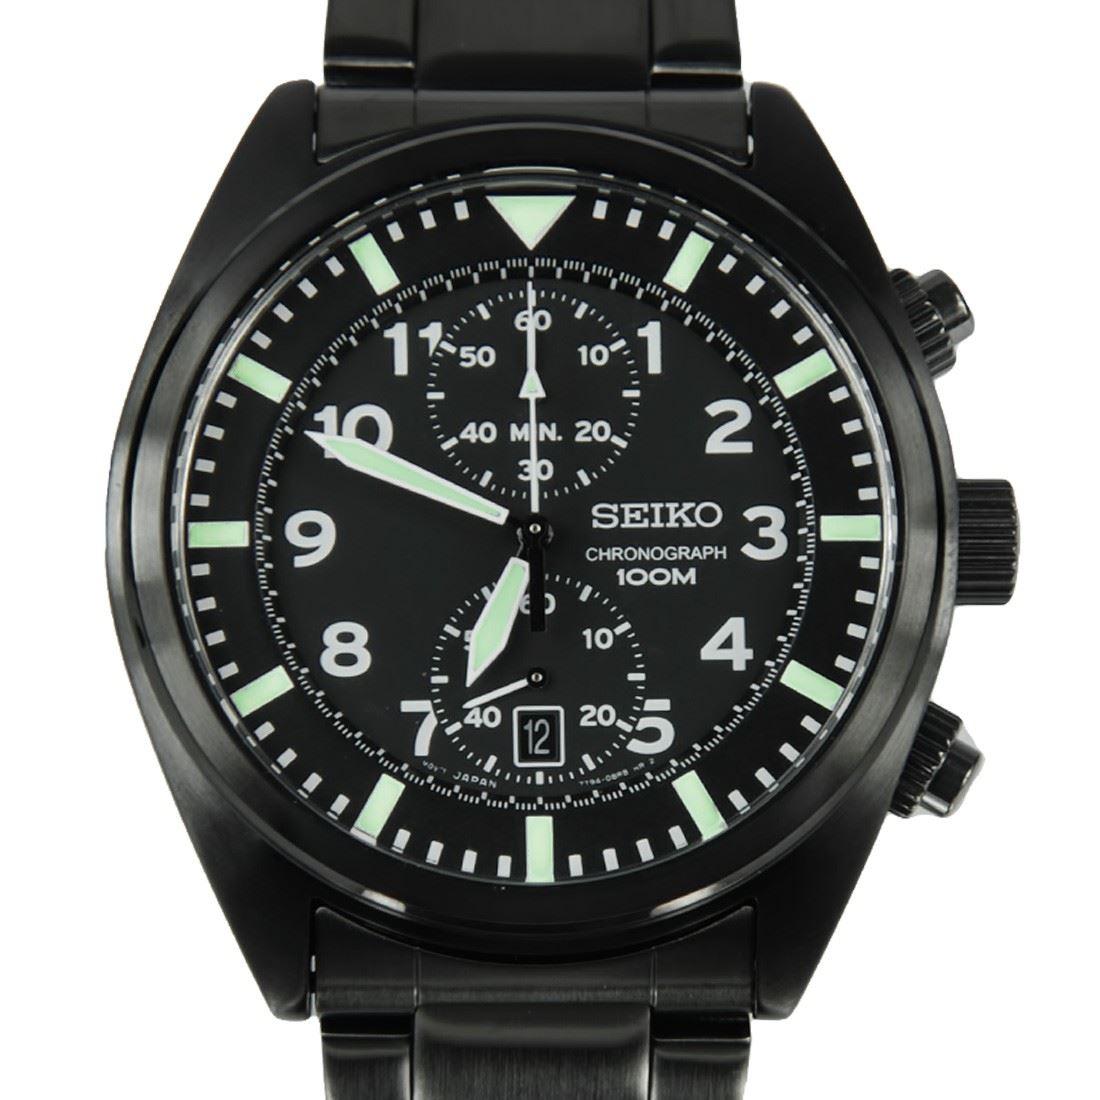 snn231p2 snn233p1 snn235p1 snn237p1 seiko mens chronograph water resistant watch ebay